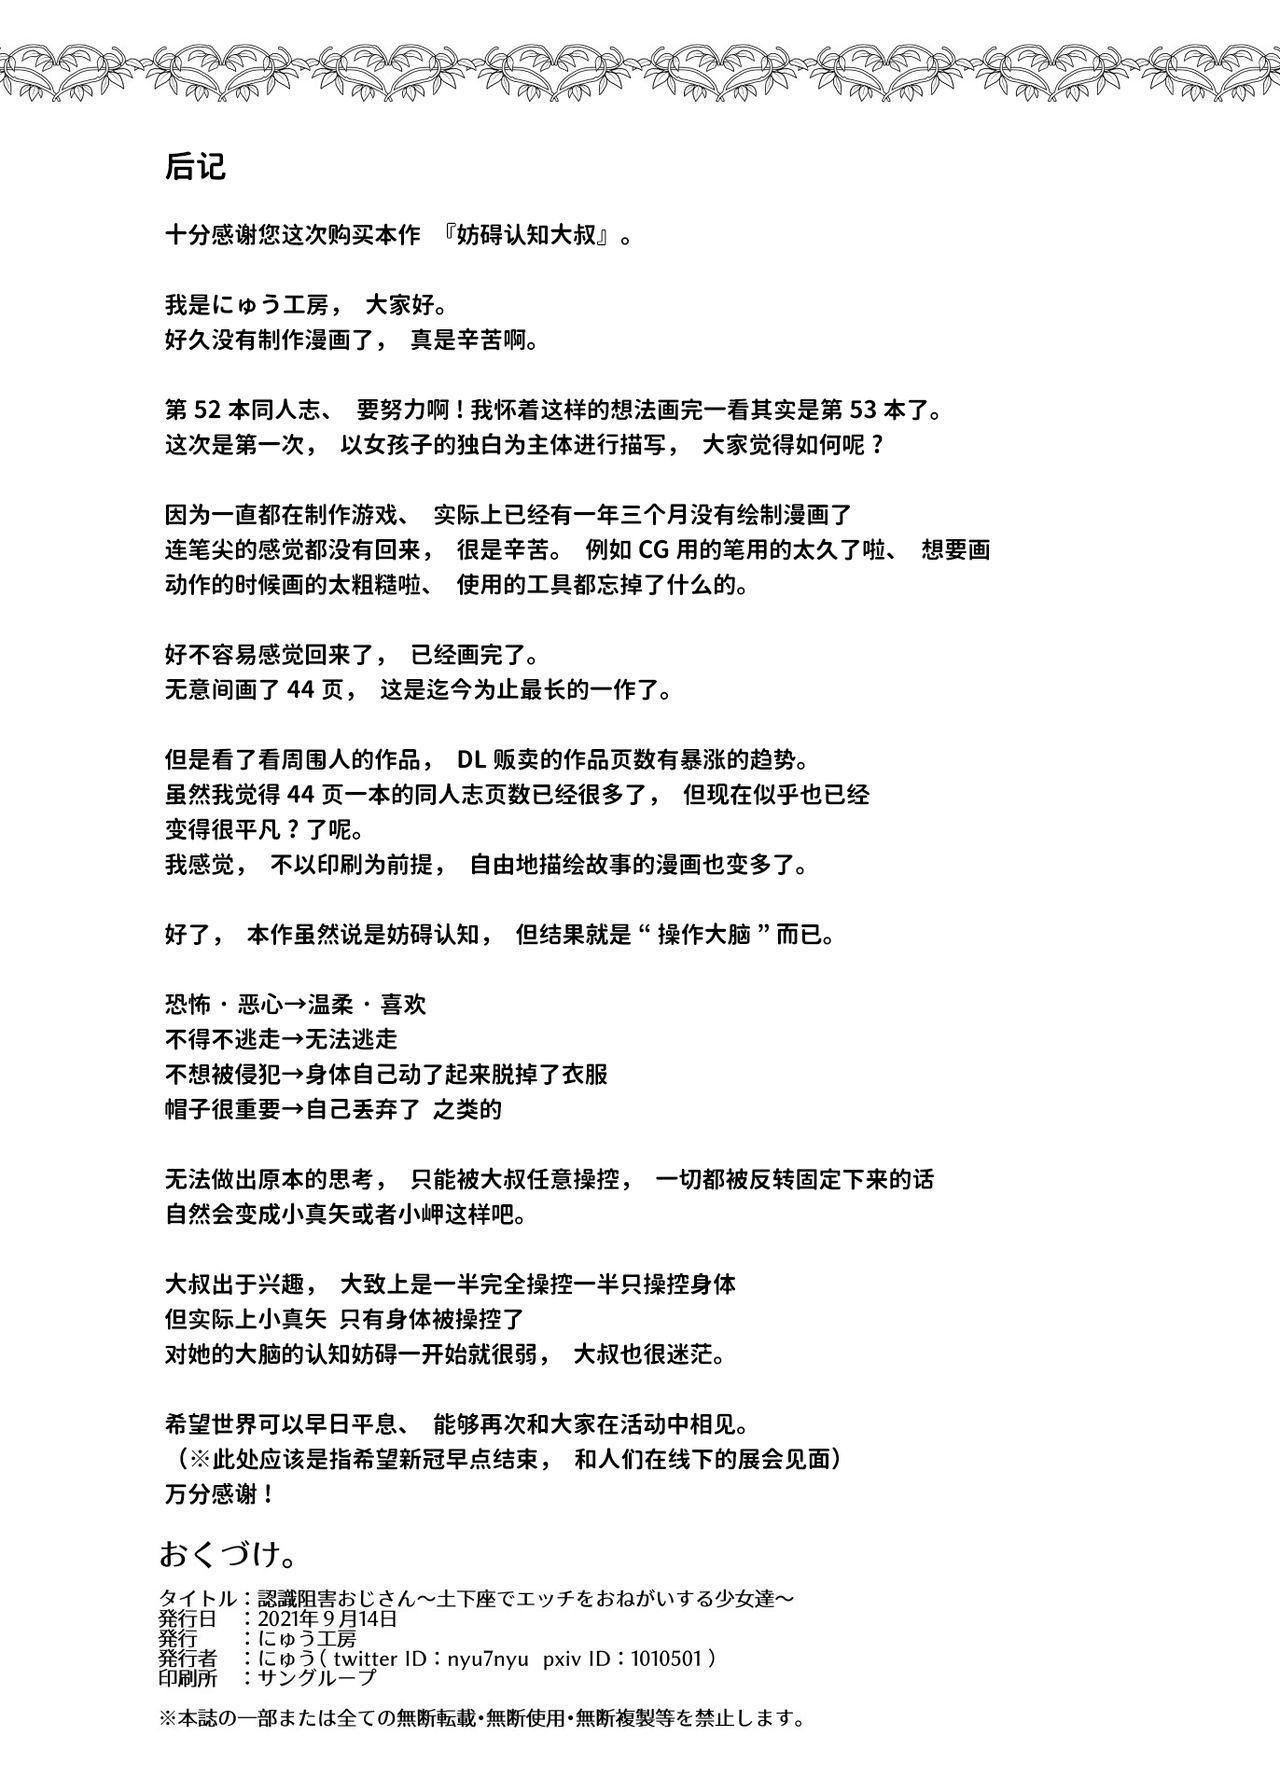 [Nyuu Koubou (Nyuu)] Ninshiki Sogai Oji-san ~Dogeza de Ecchi o Onegai suru Shoujo-tachi~ [Chinese] [神官冰点汉化] [Digital] 48